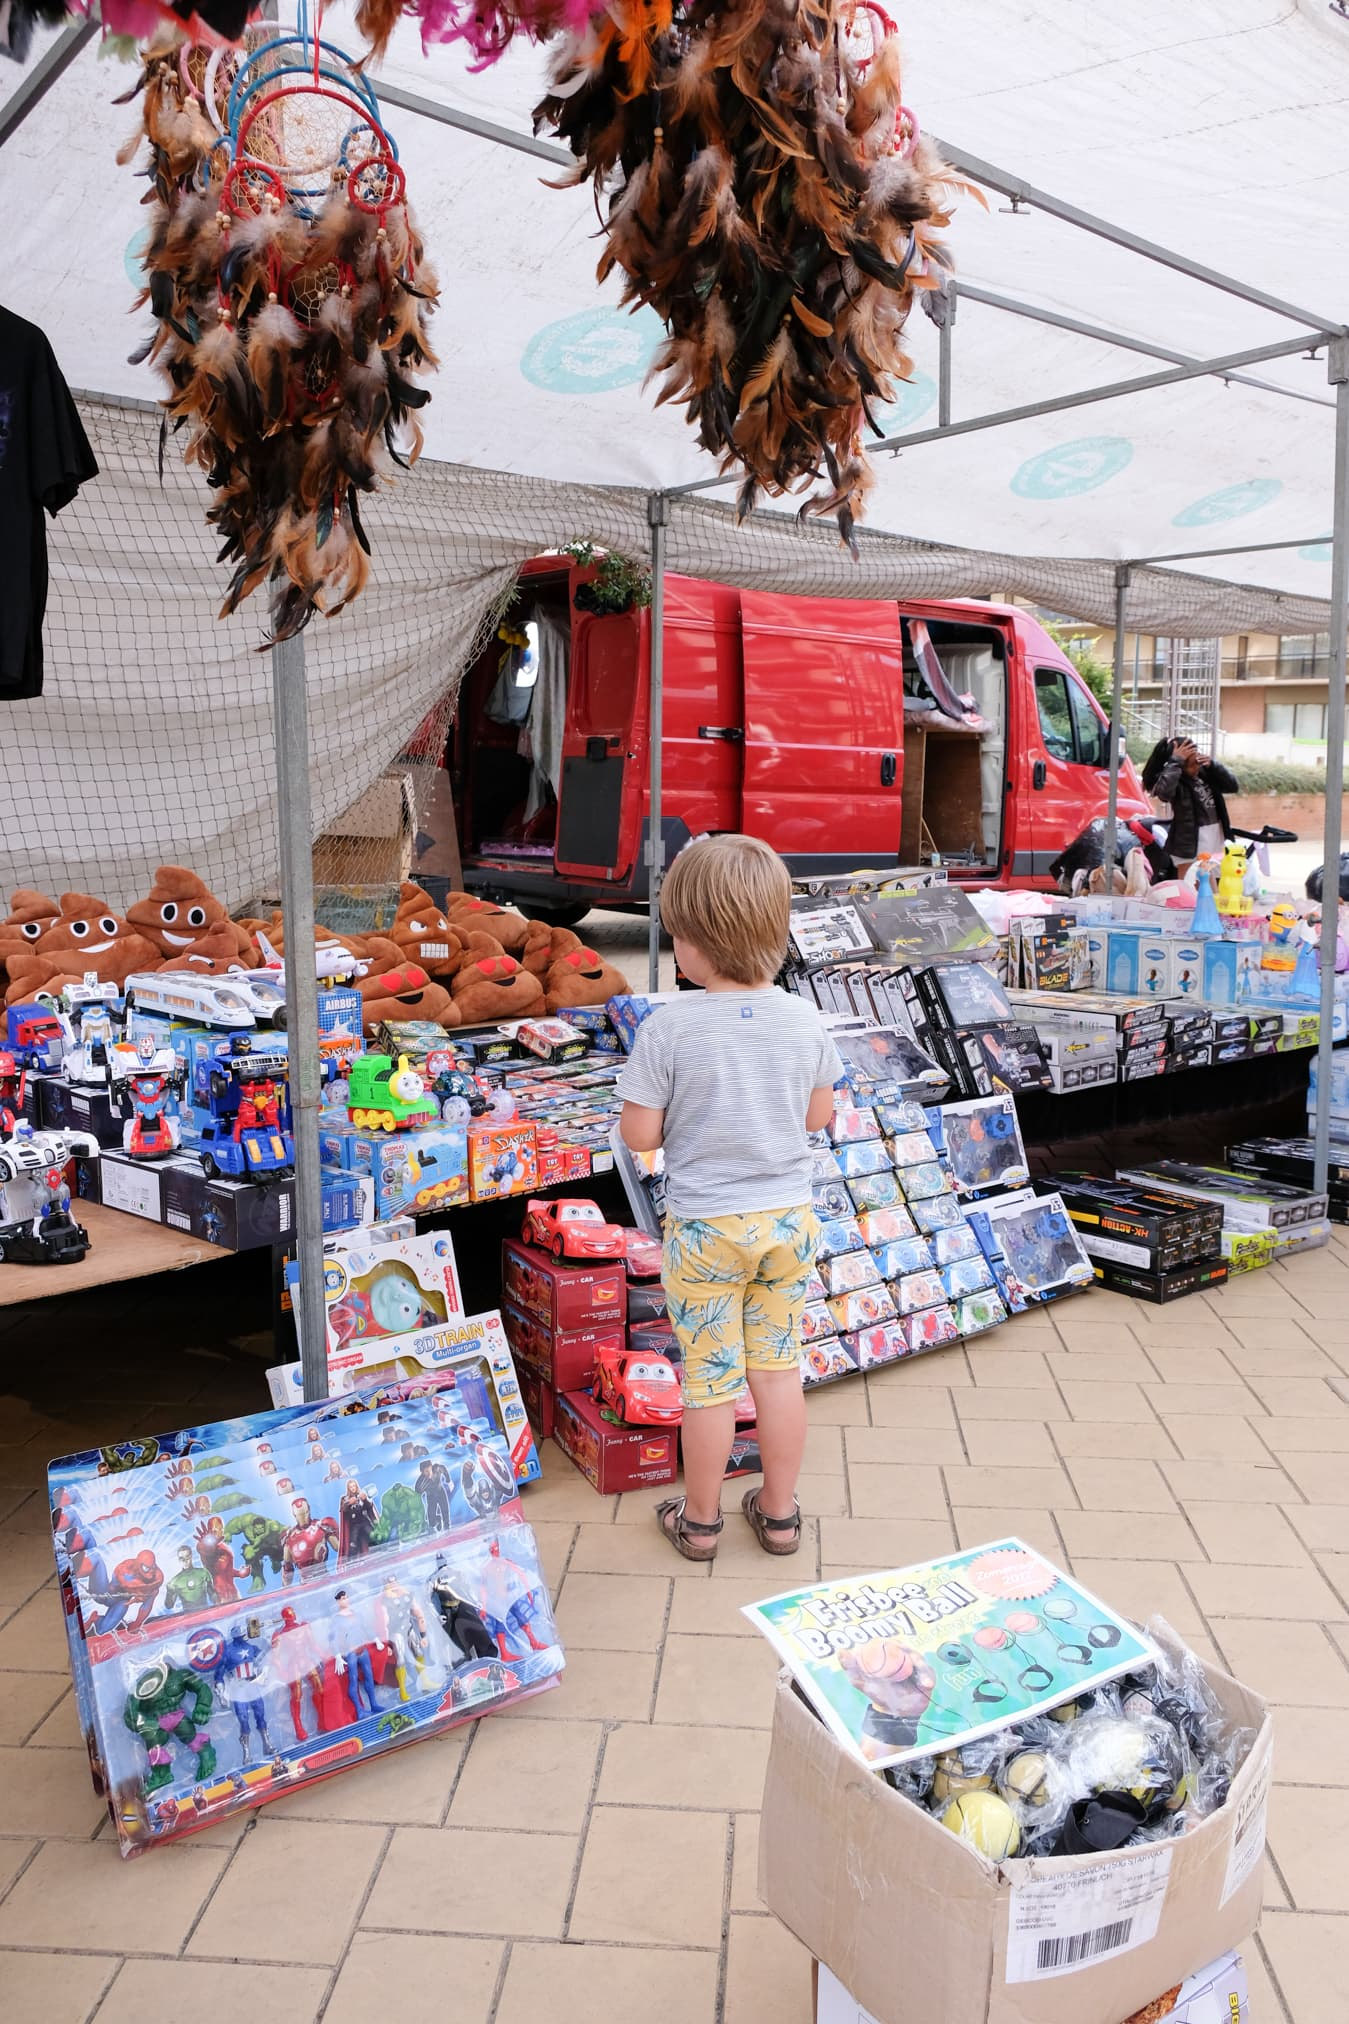 markt boulevard strand de panne